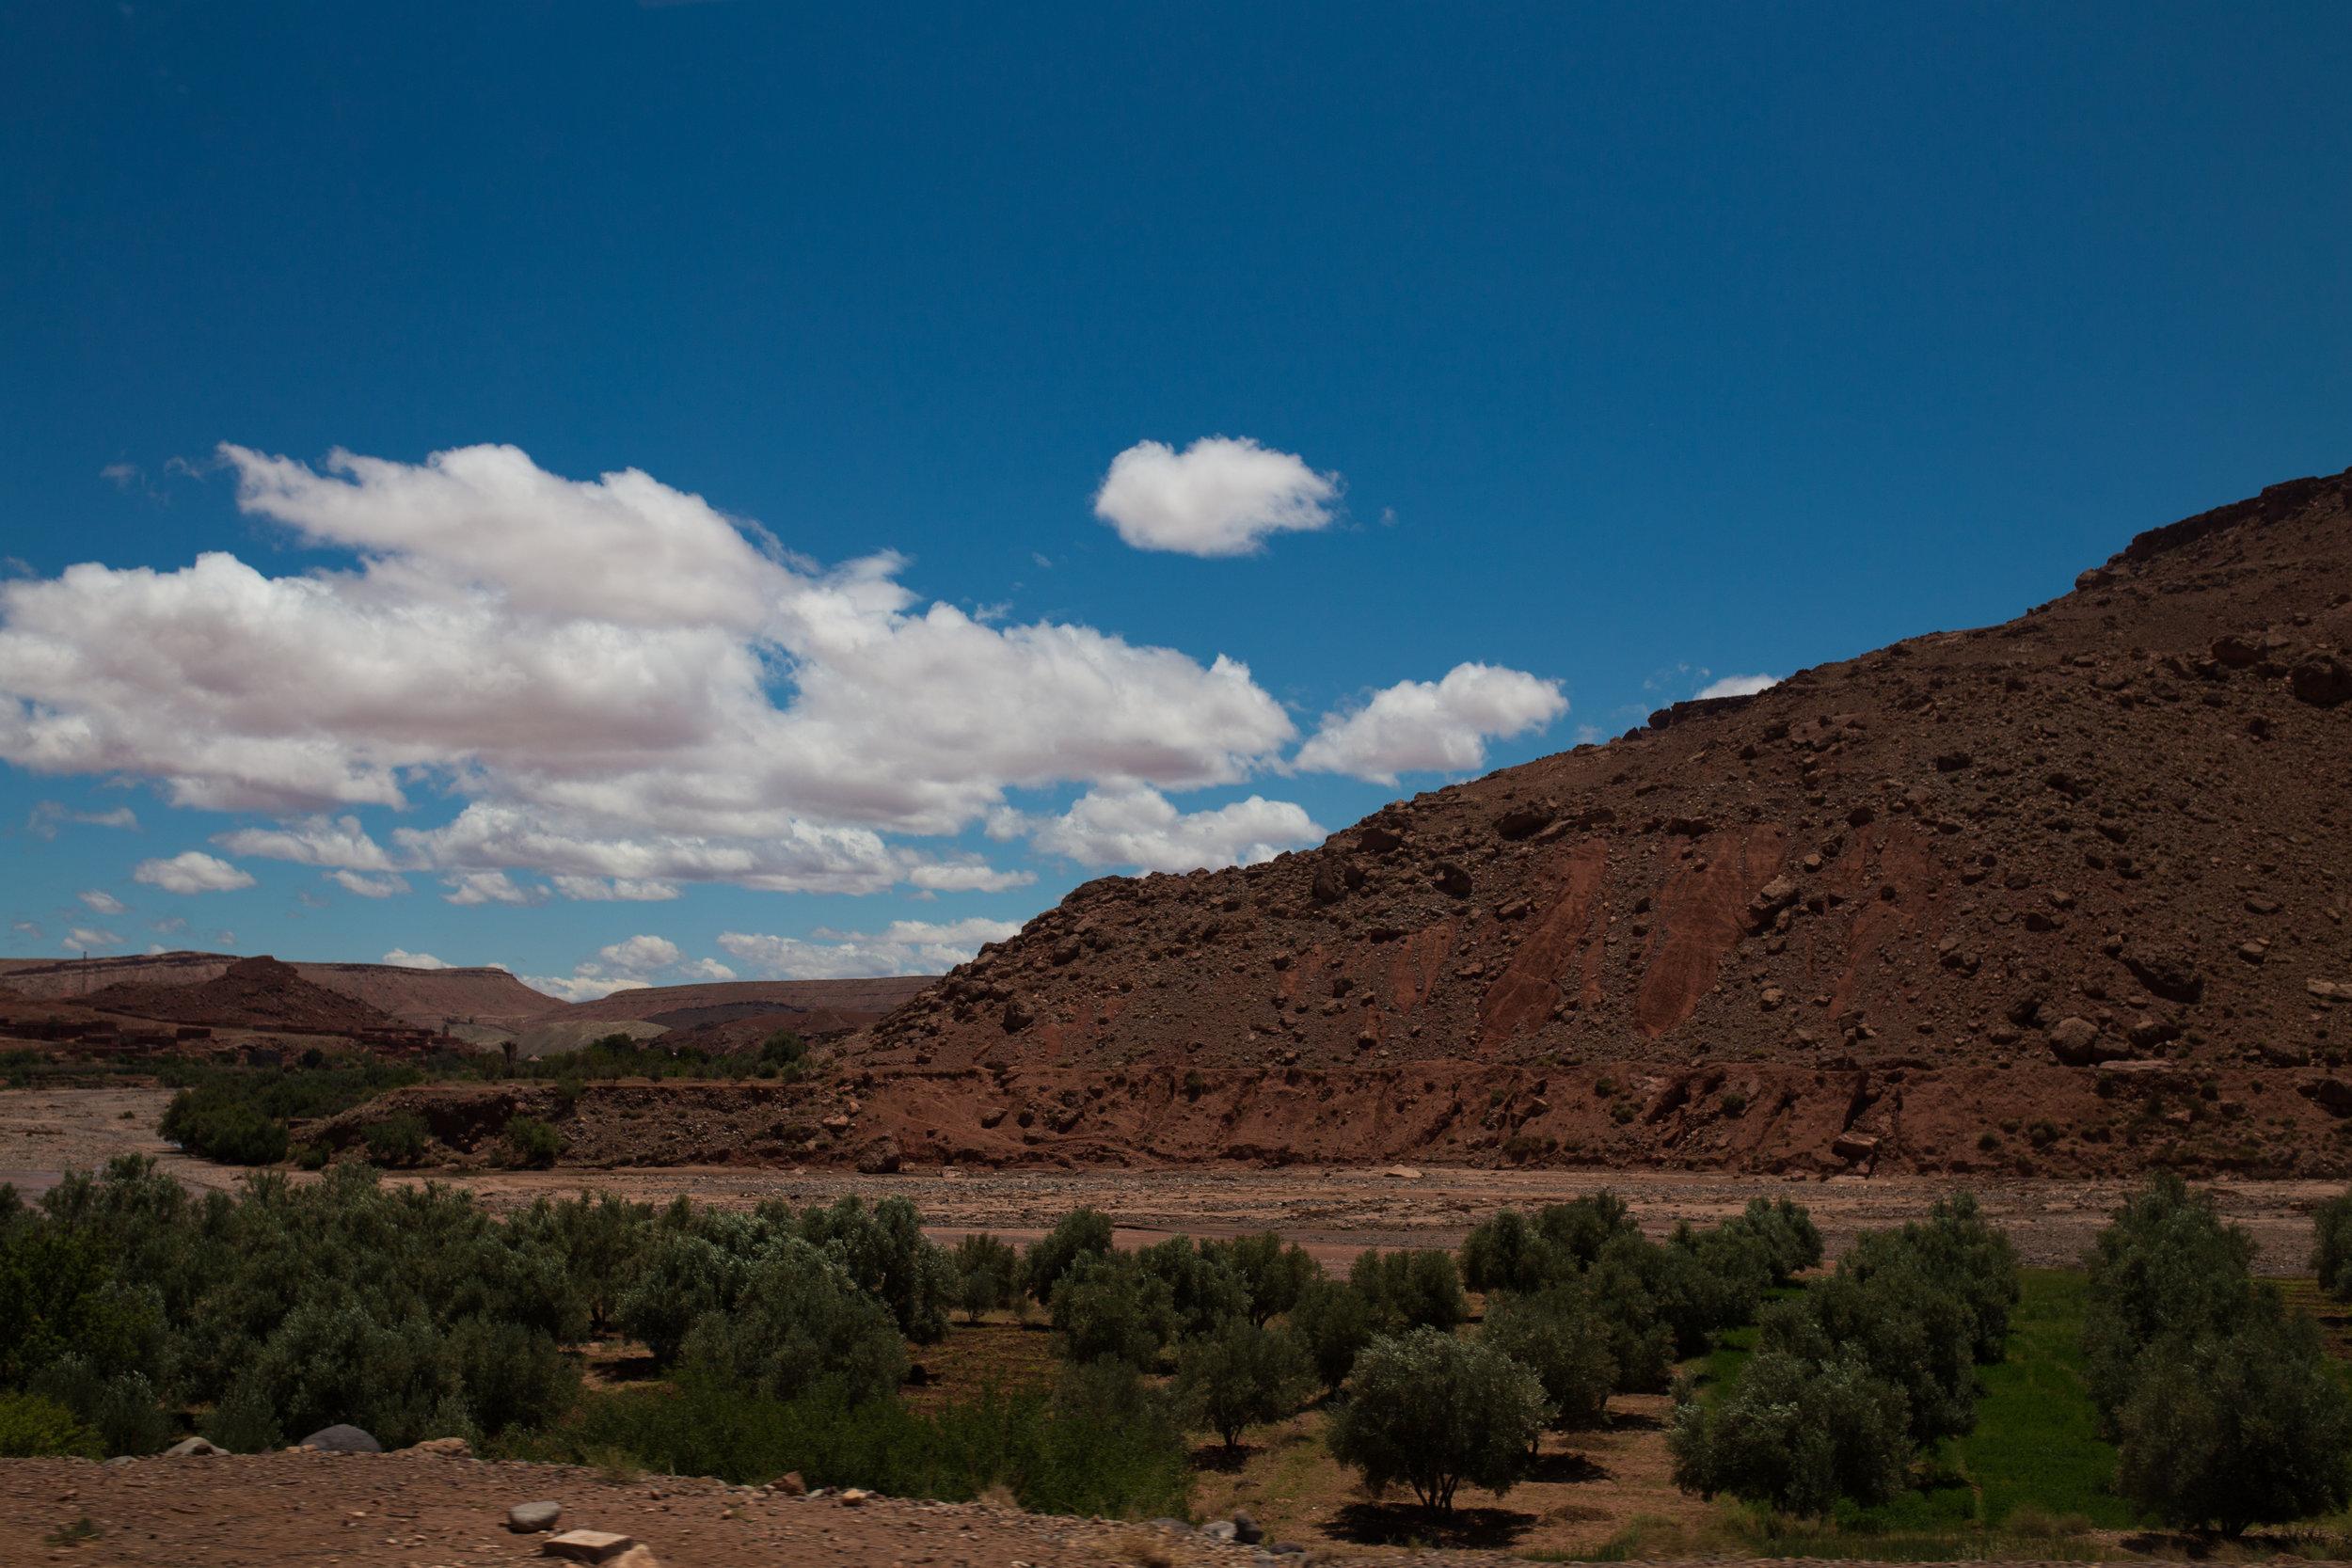 morocco-morocco travel-visit morocco-travel-travel photography-travel photographer-alina mendoza-alina mendoza photography-27.jpg